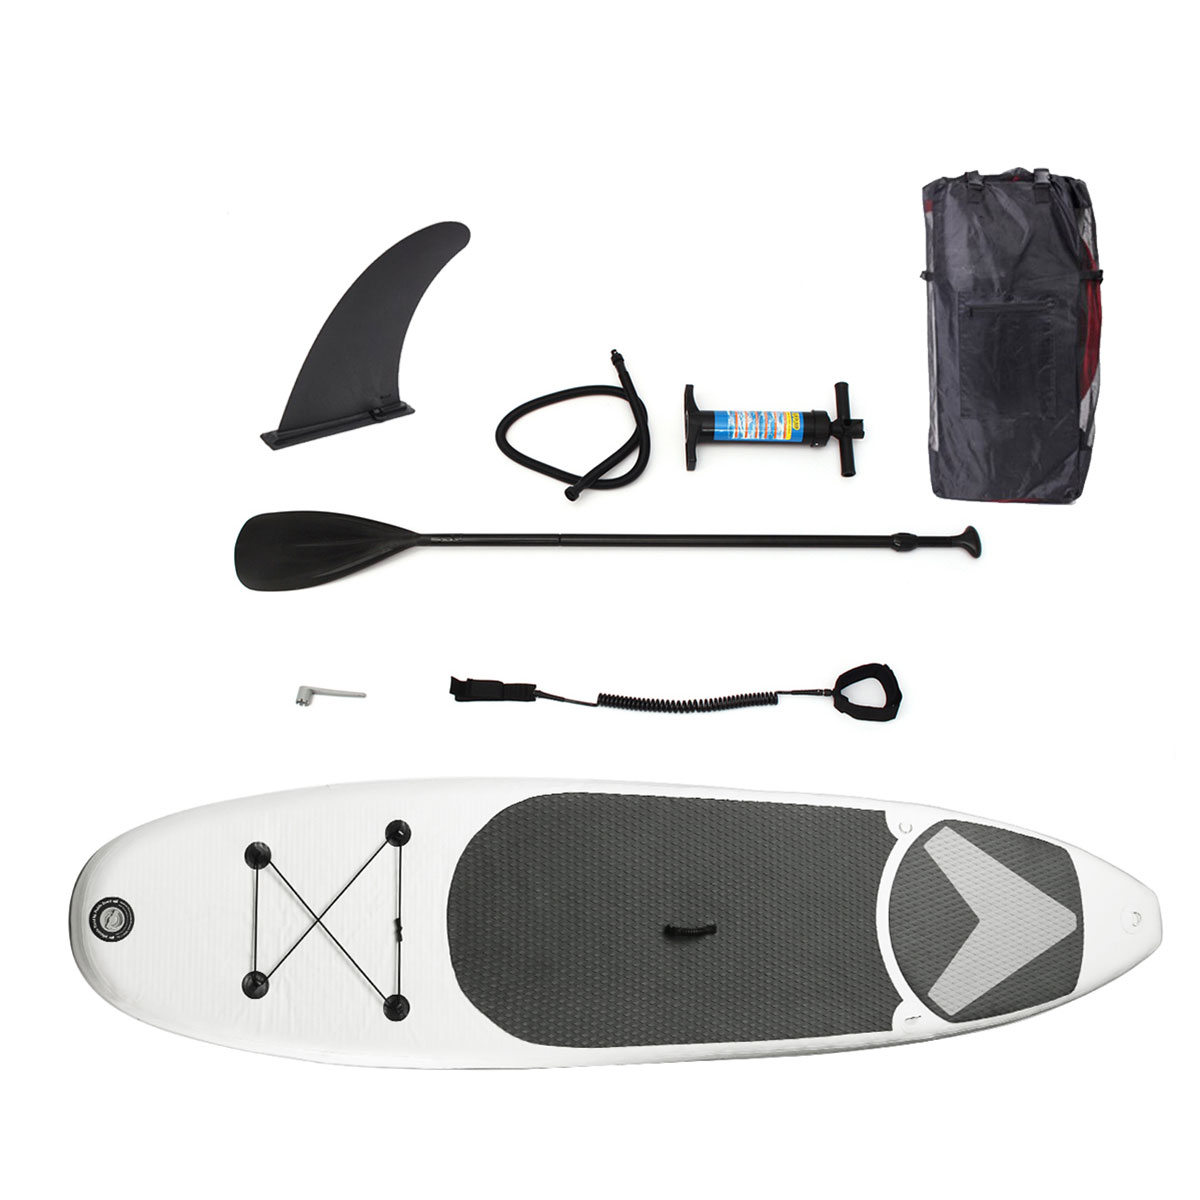 SGODDE 365*83*15 cm 12ft Portable Gonflable Surf Aileron Planche de Surf Stand Up Paddle Board - 3